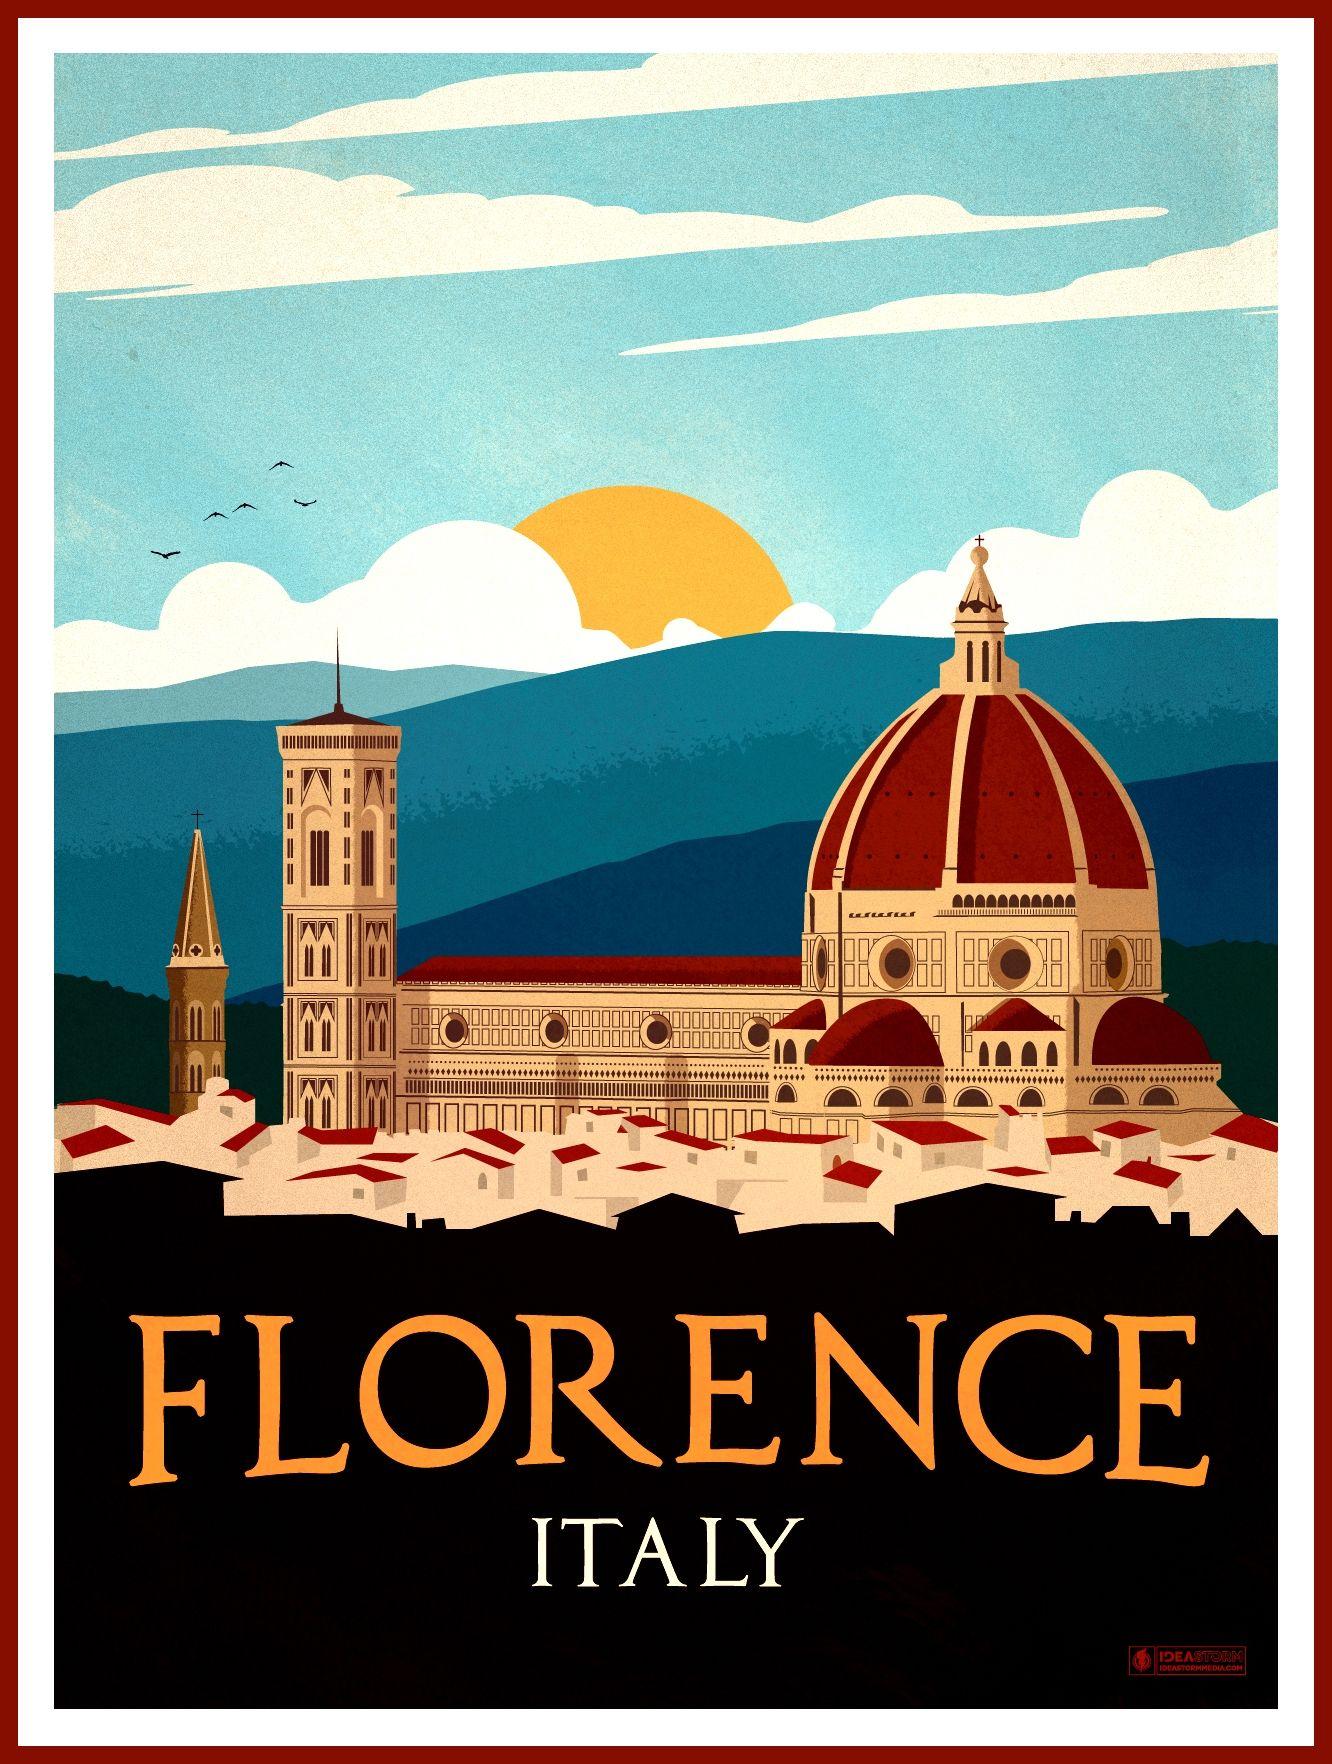 Florence 44350867474 O Vintage Retro Travel Ads Poster